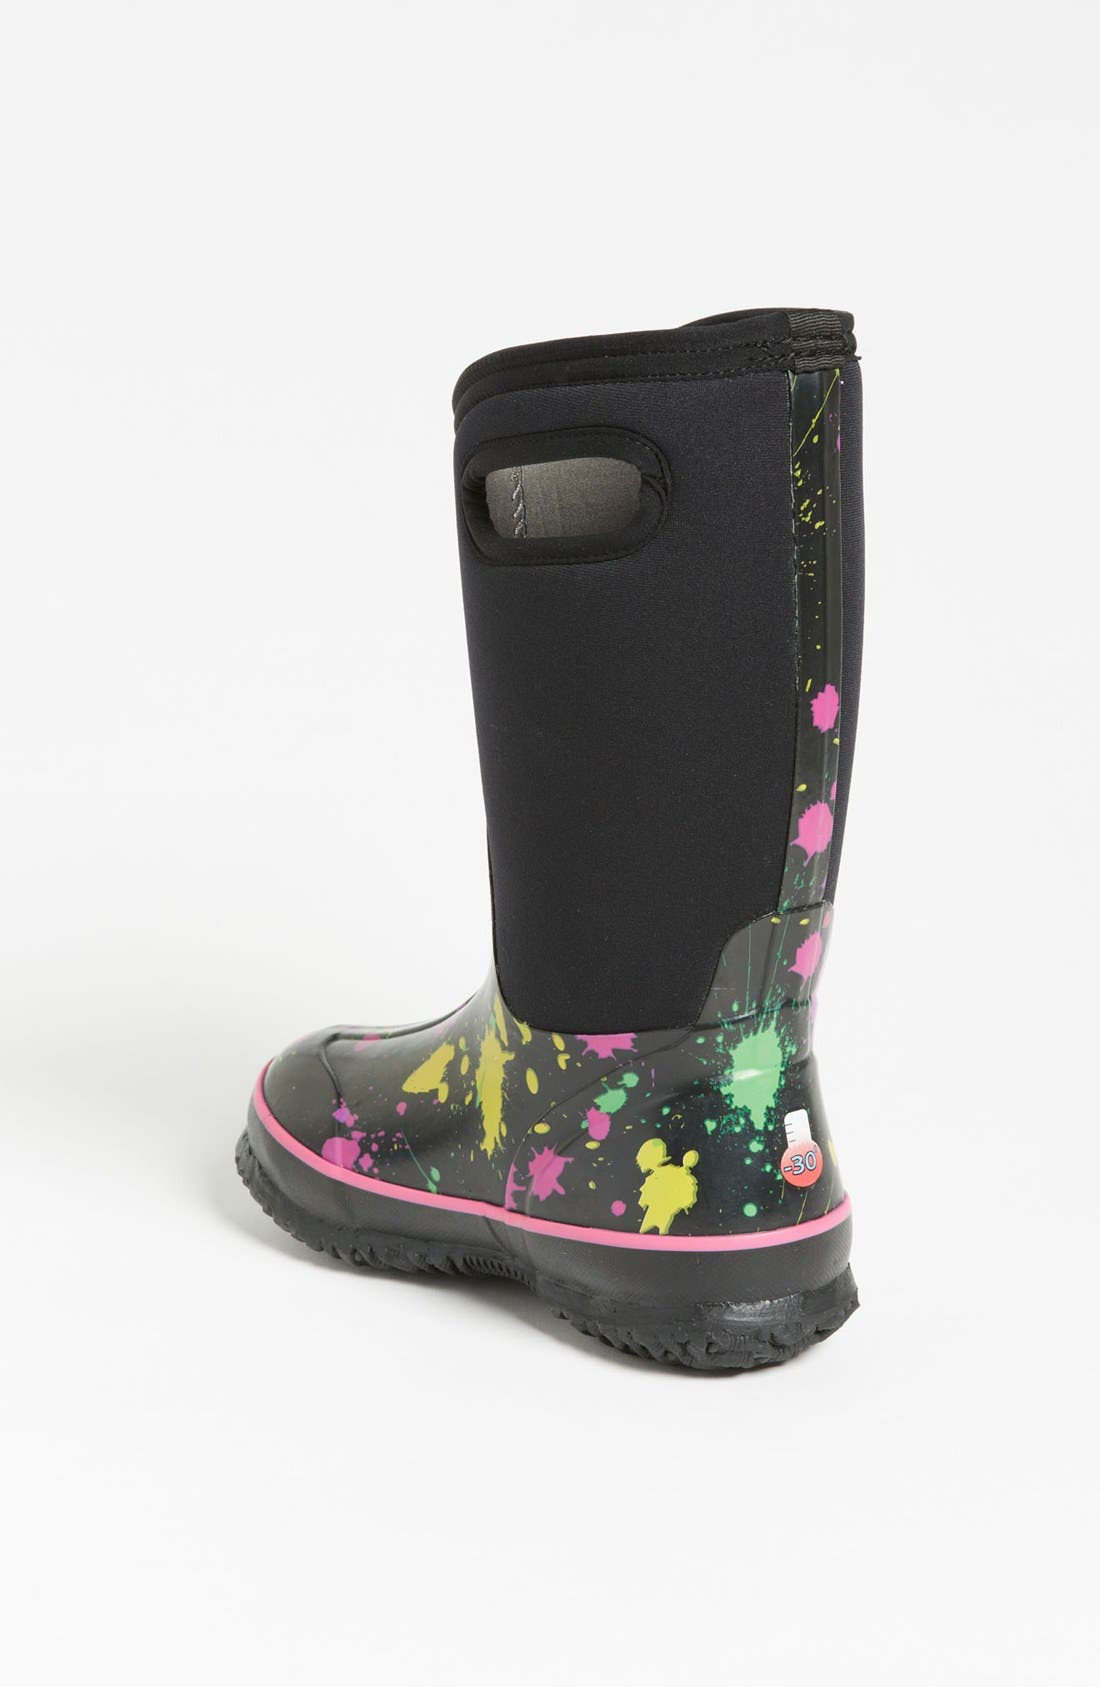 Alternate Image 2  - Bogs 'Classic High - Paint Splat' Waterproof Boot (Toddler, Little Kid & Big Kid)